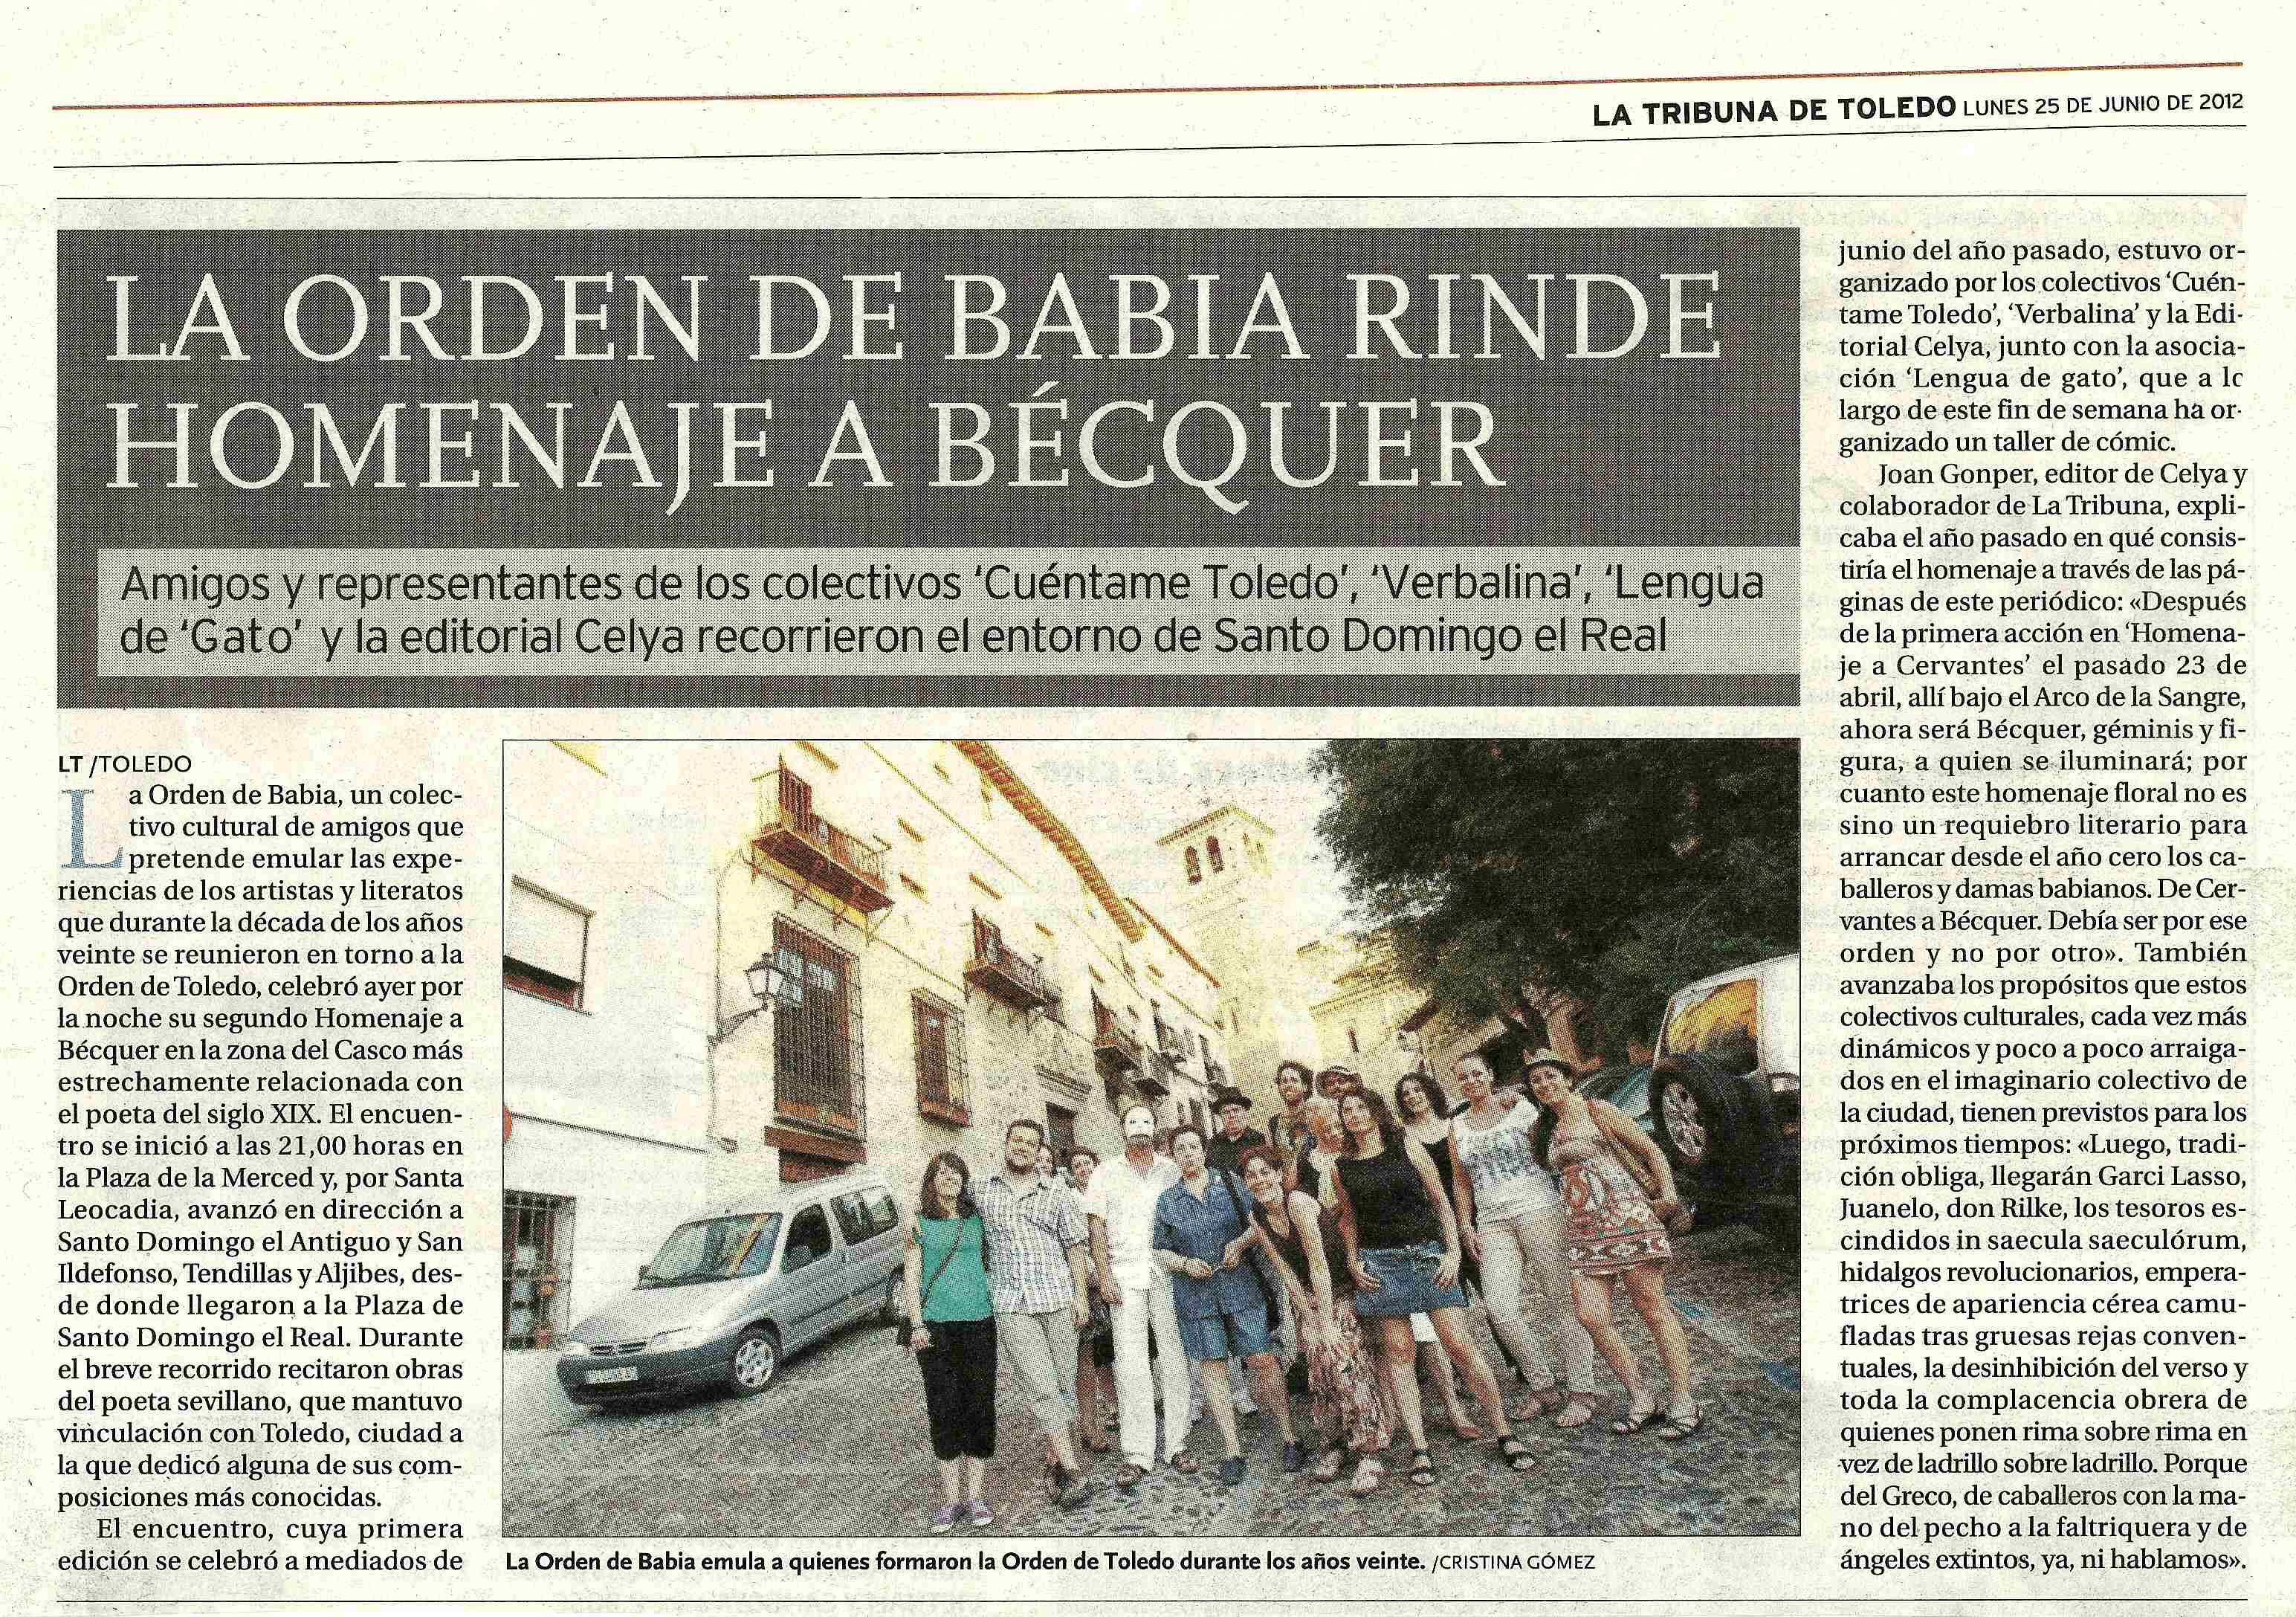 LA TRIBUNA DE TOLEDO : La Orden de Babia. II HOMENAJE A BÉCQUER, en Toledo.